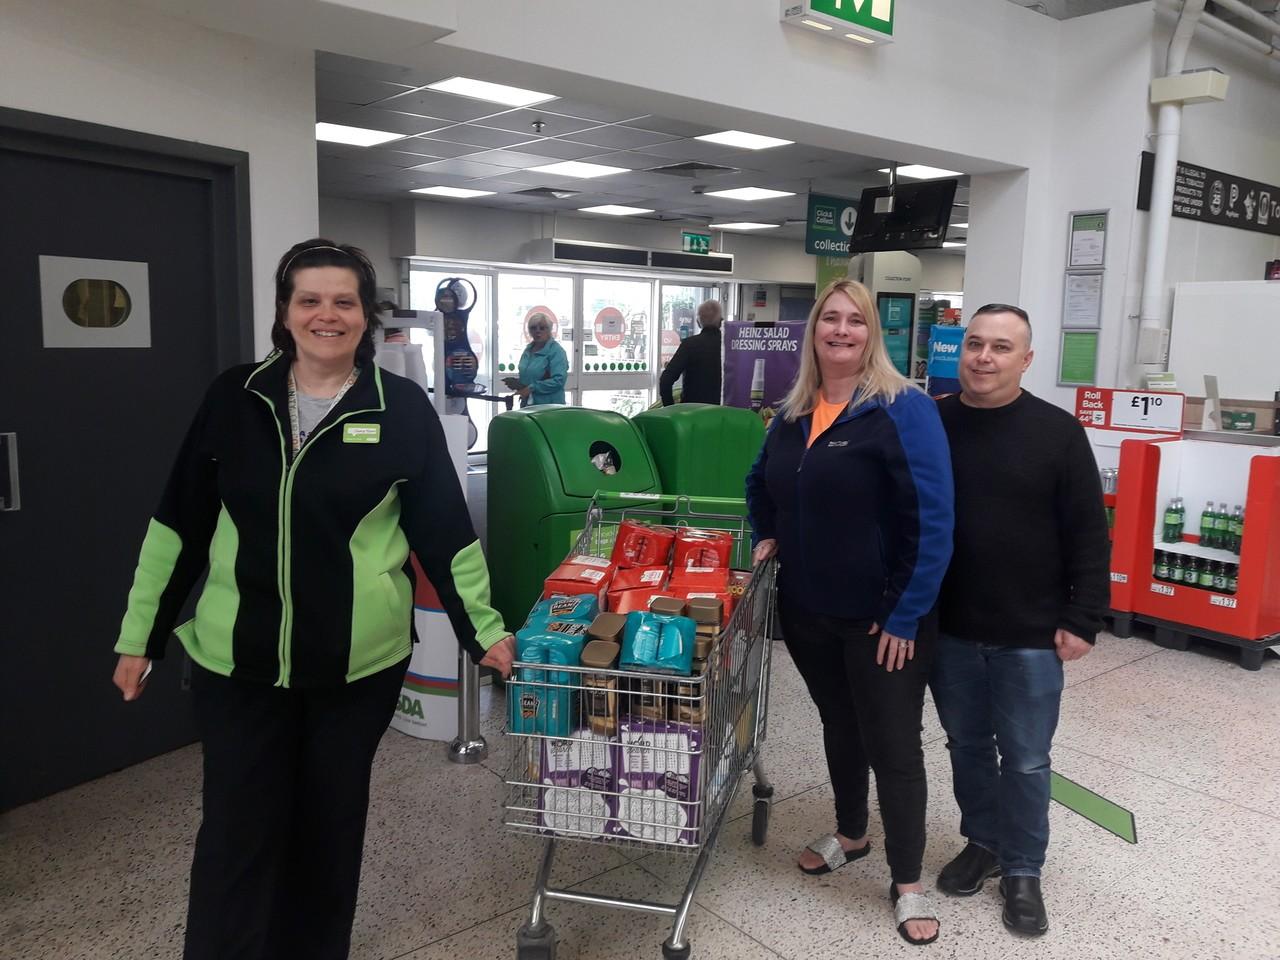 Donation toAbram Ward Community Cooperative | Asda Golborne